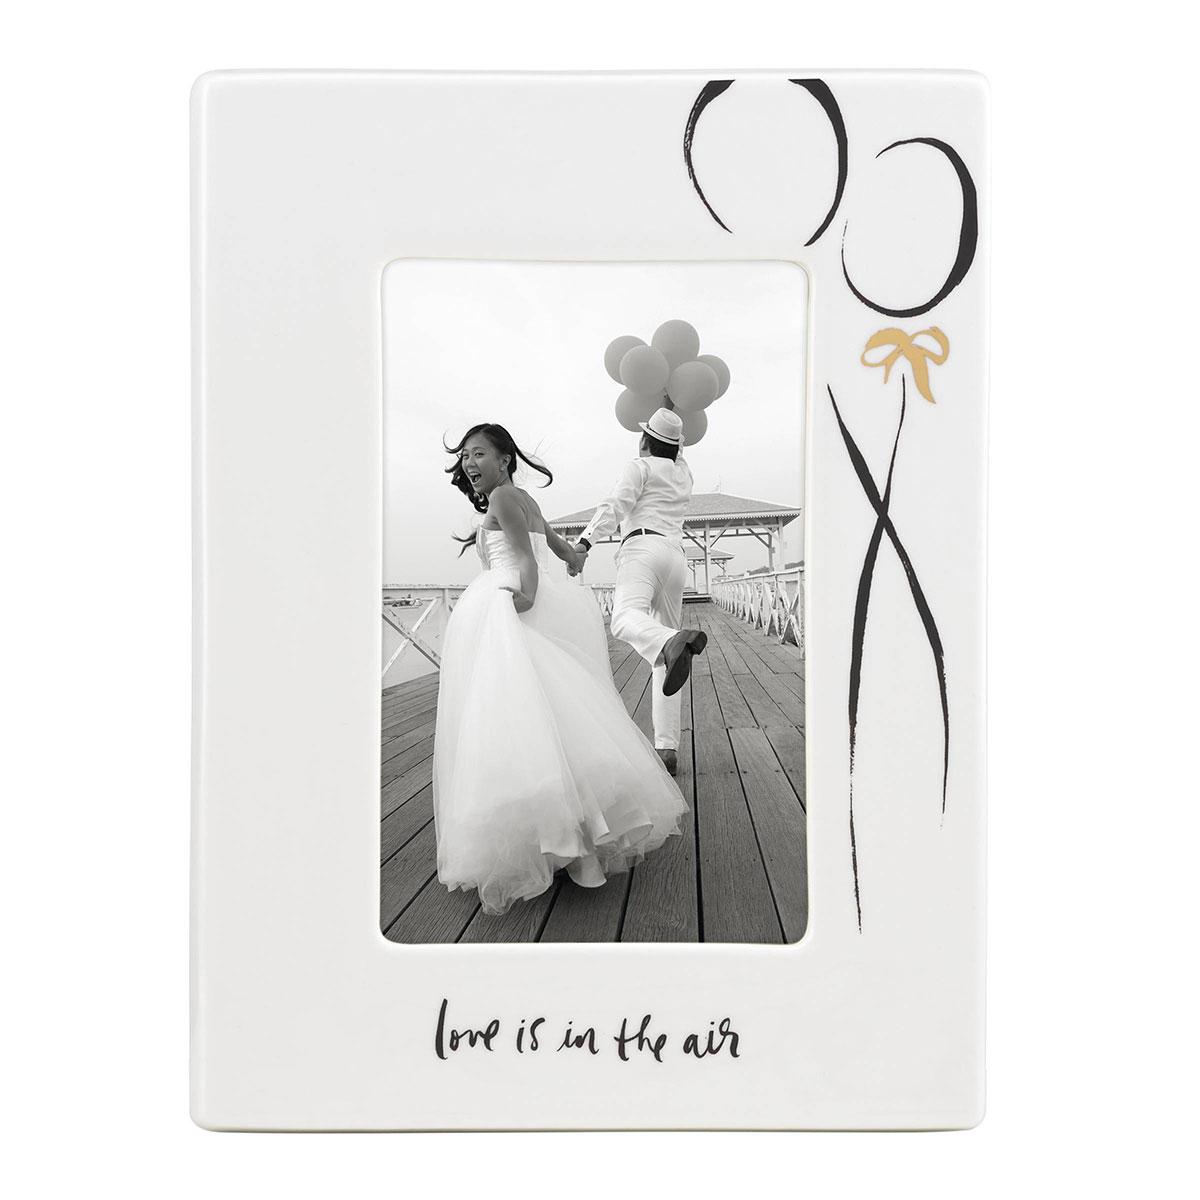 Kate Spade China by Lenox, Bridal Party 4x6 Frame